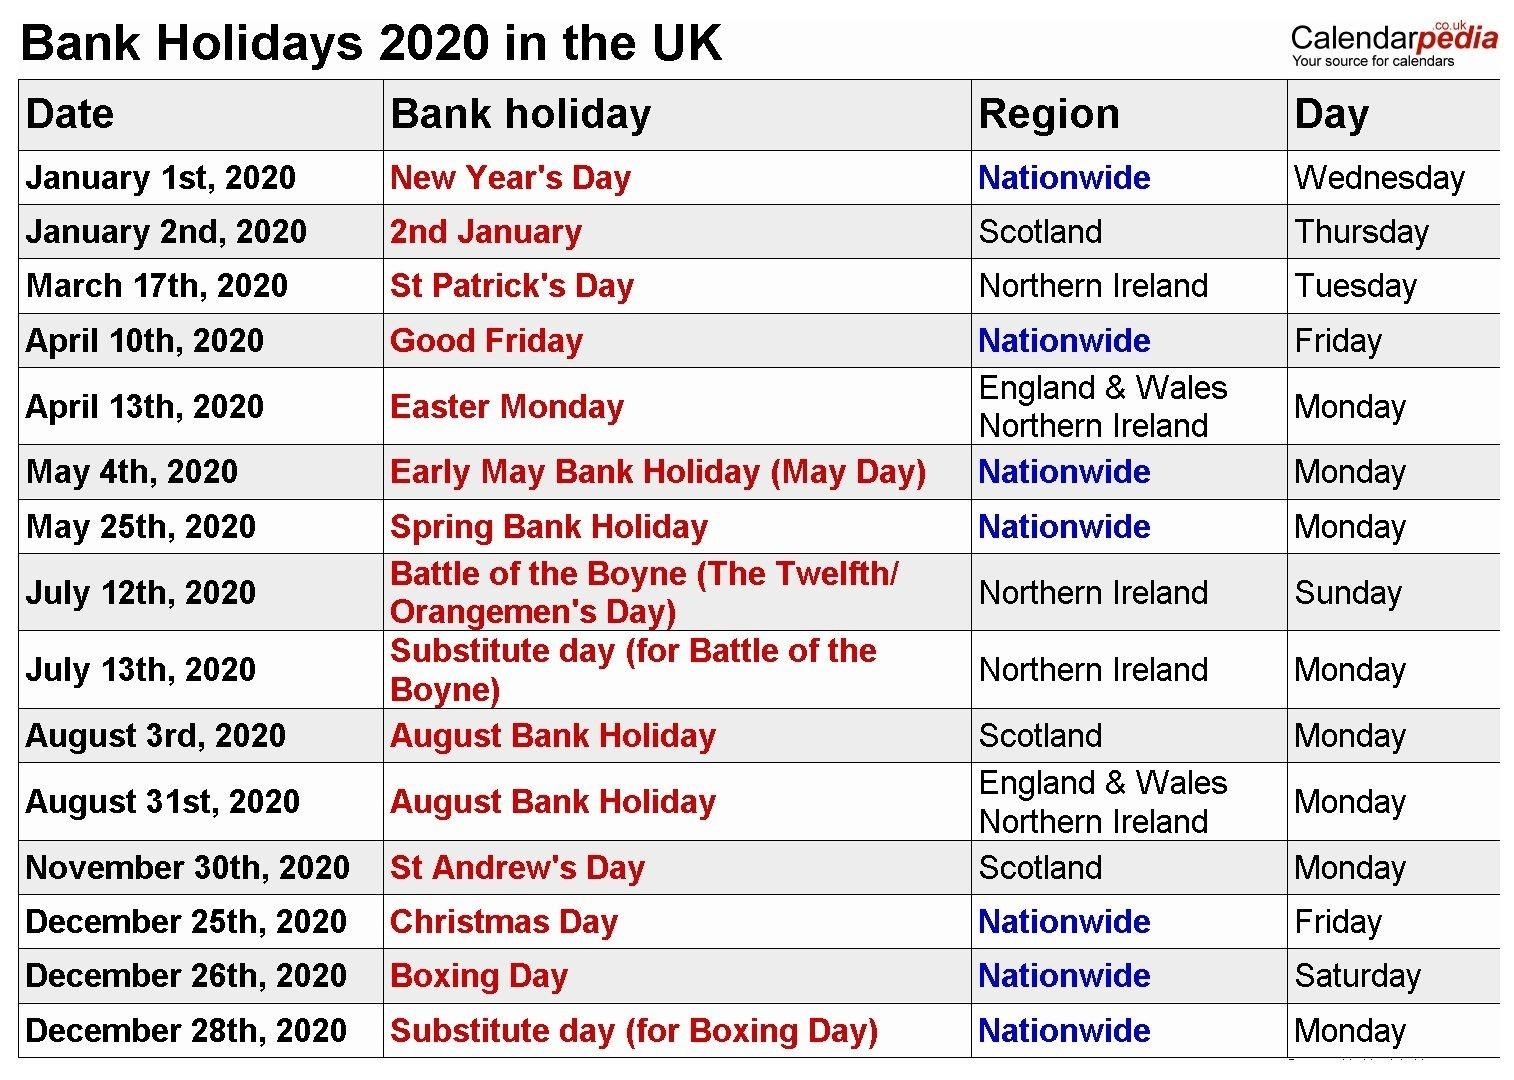 2020 Uk Bank Holidays Calendar | Bank Holiday Calendar-Printable Calendar 2020 With Bank Holidays